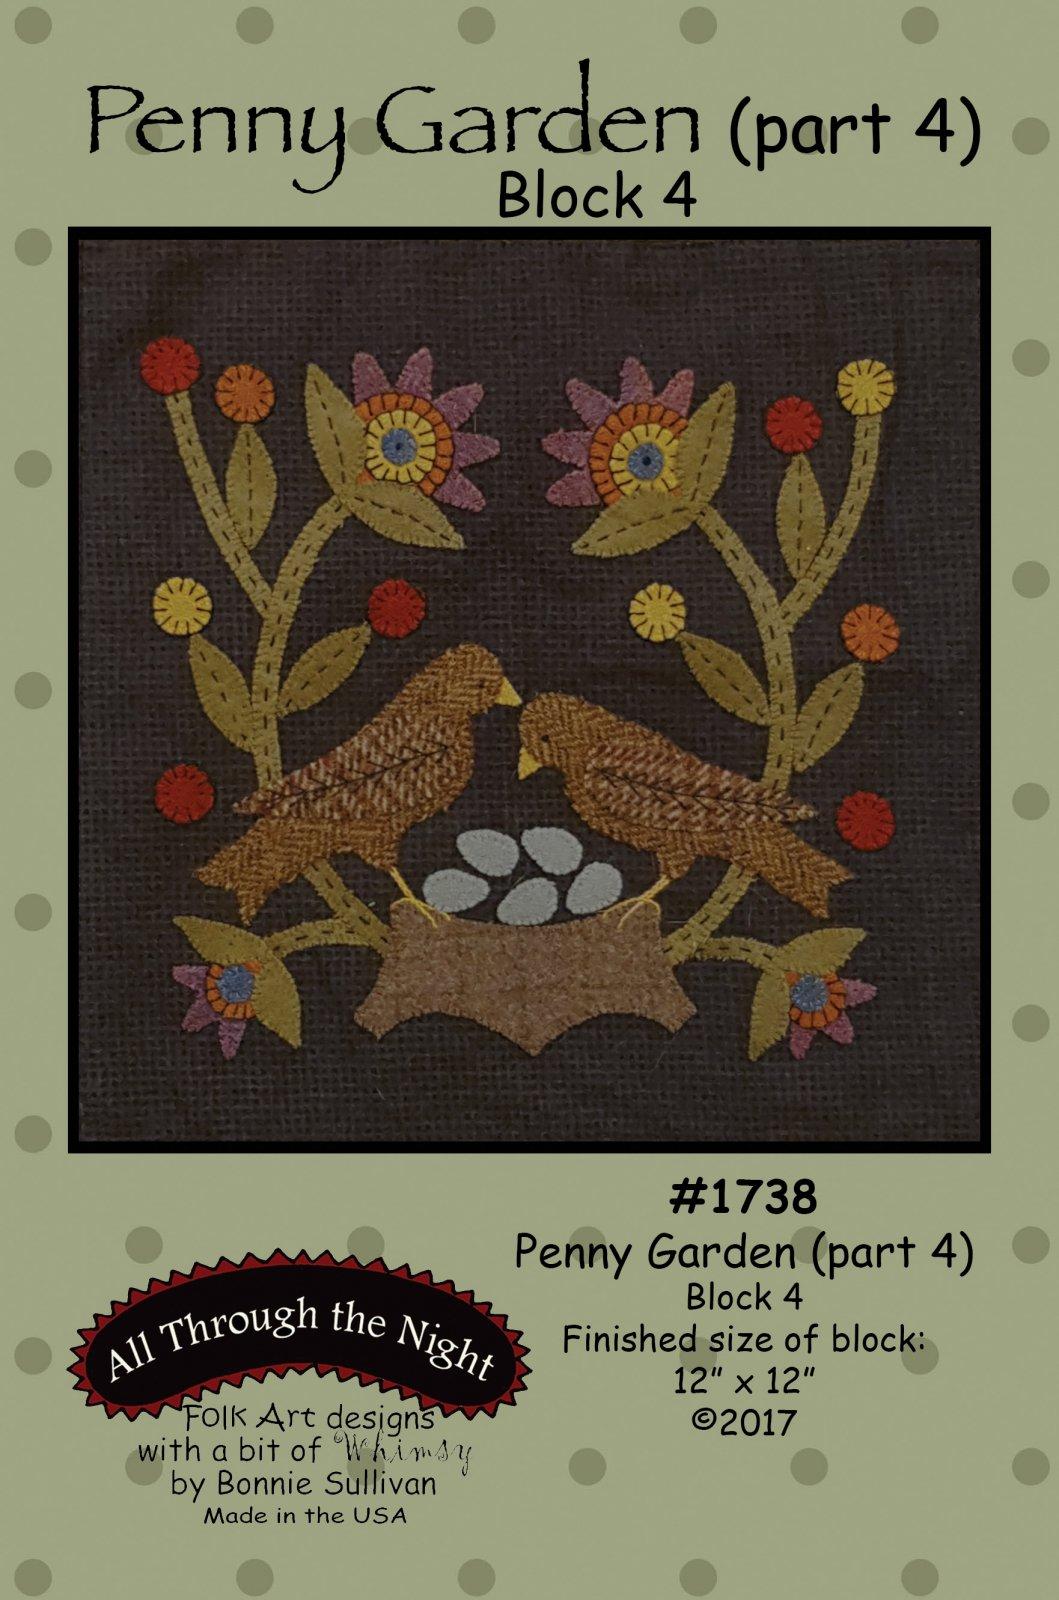 1738 Penny Garden (part 4)